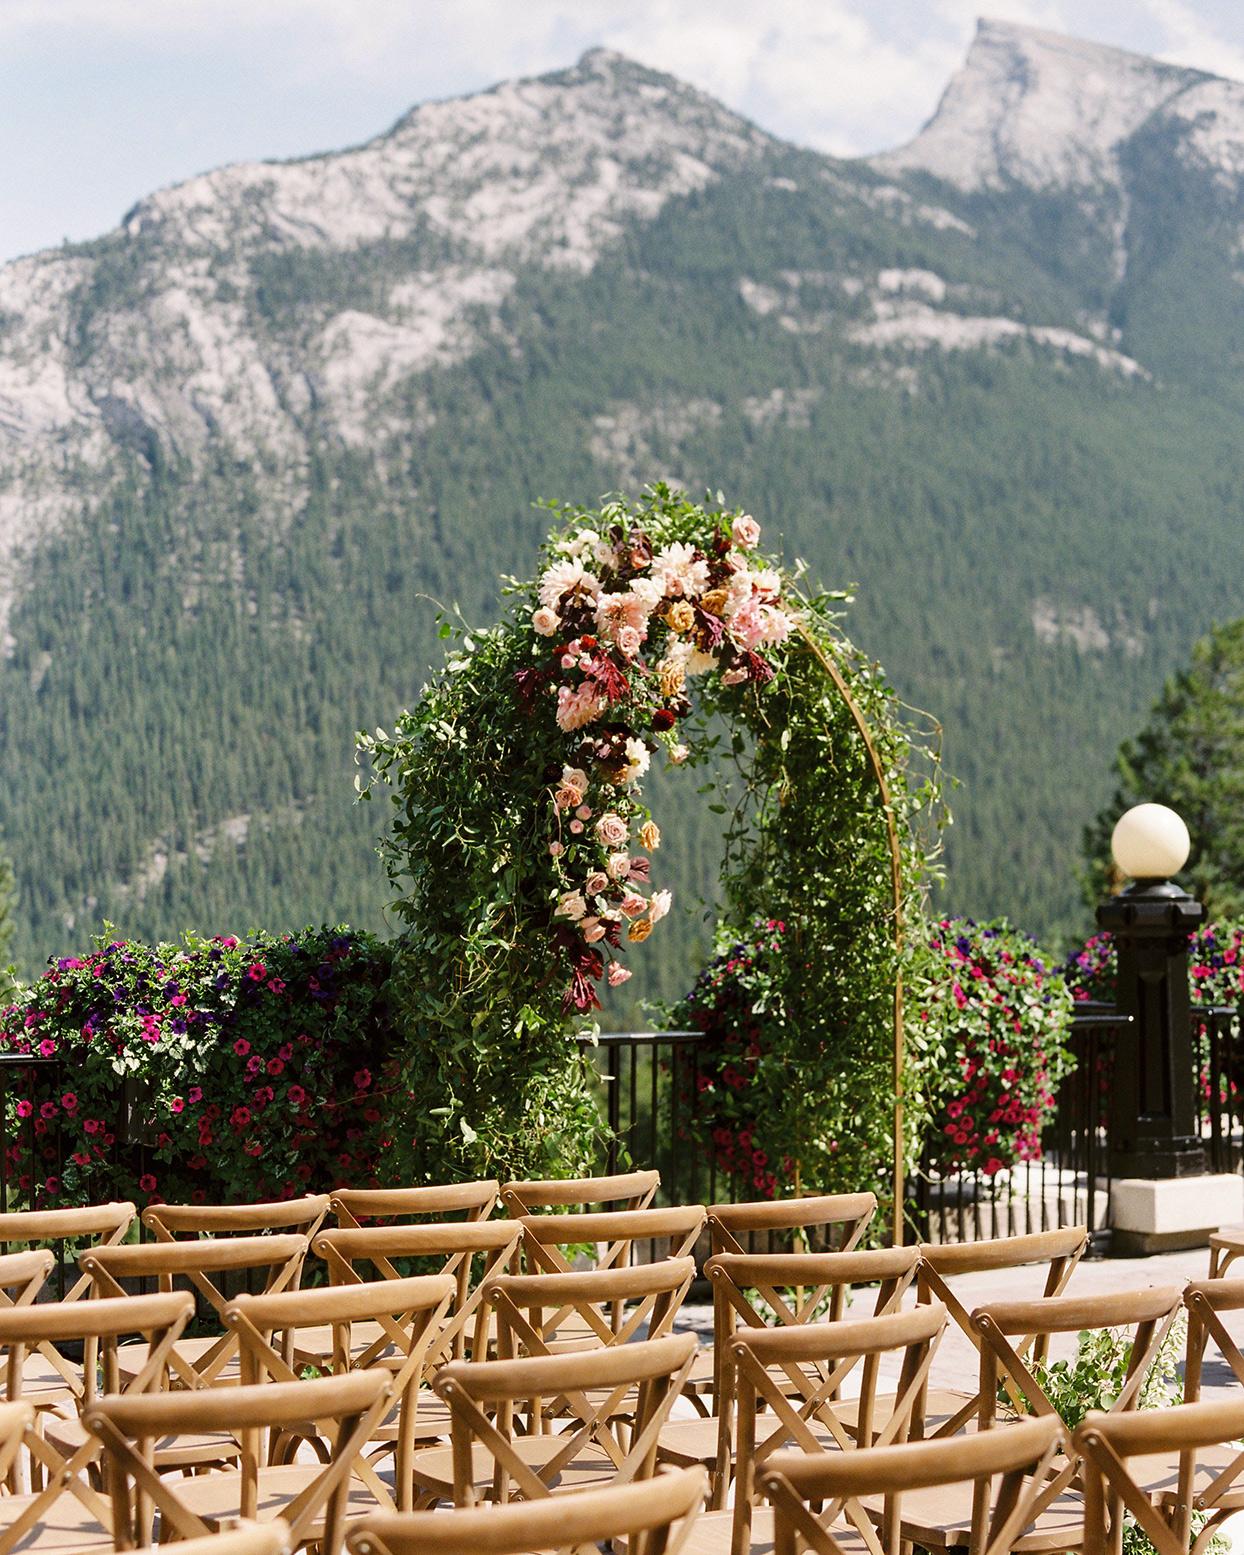 katie nicholas wedding arch with mountain backdrop